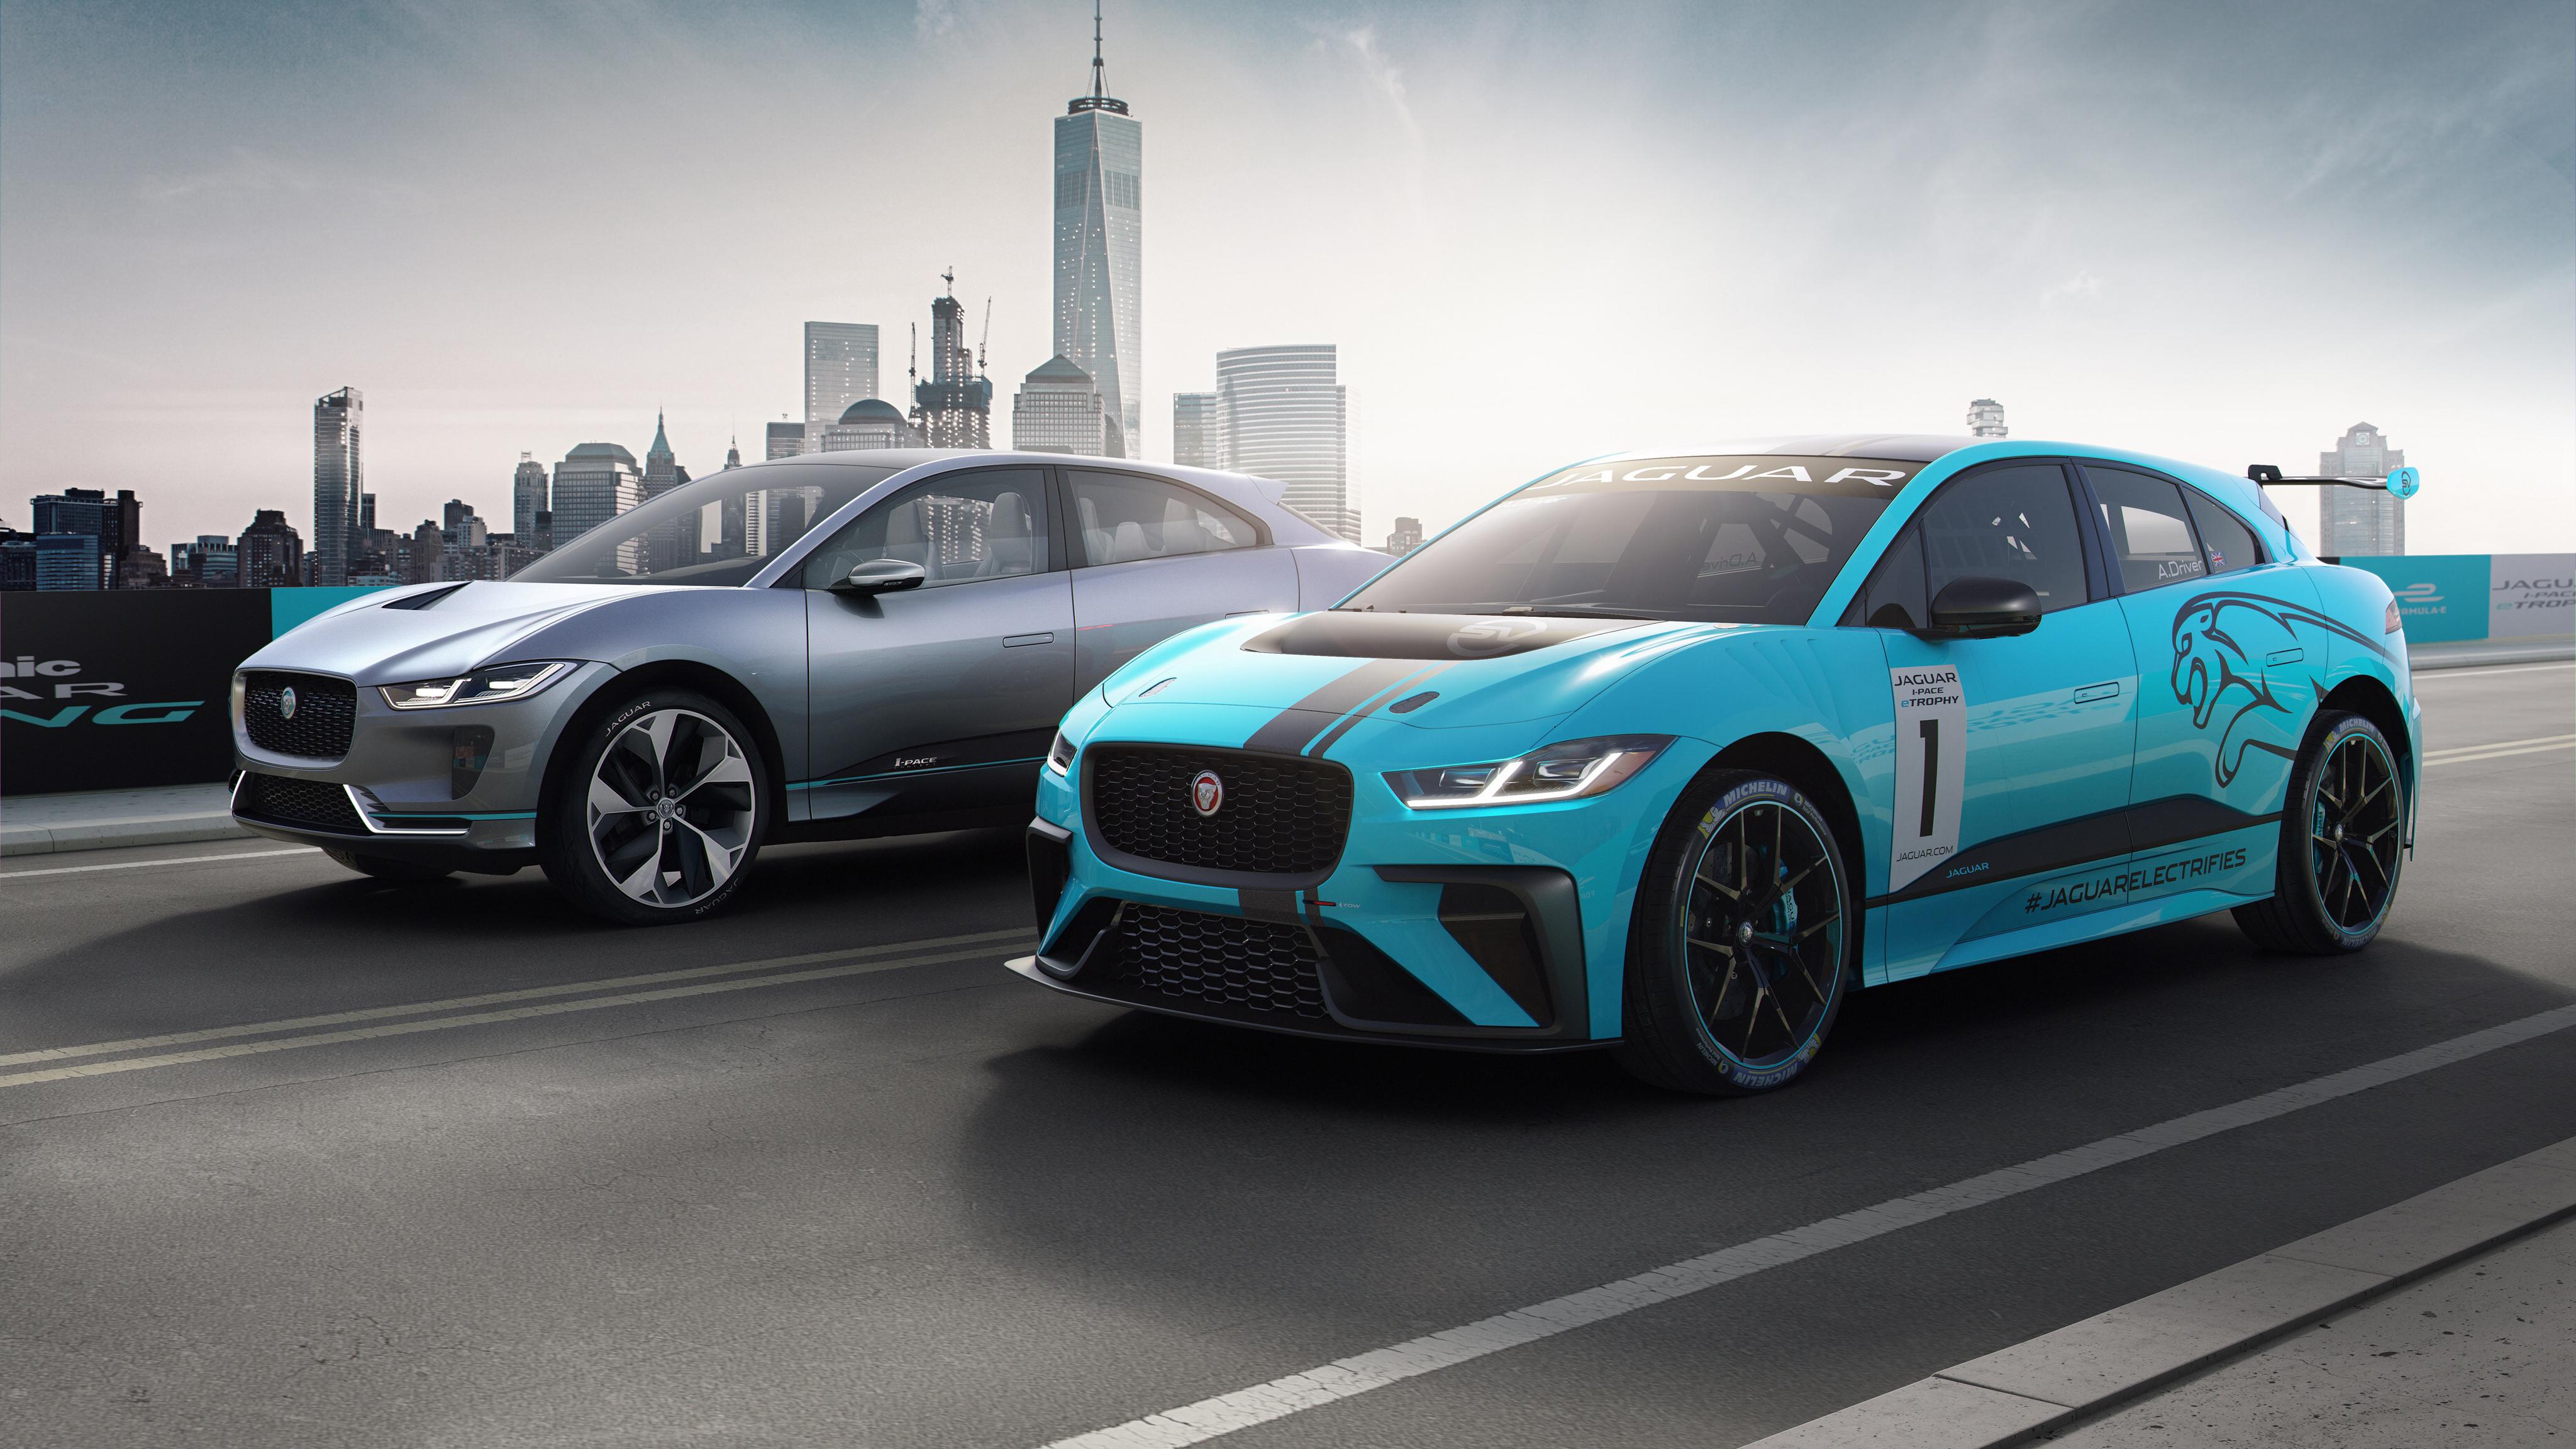 Dynamic Wallpaper Iphone X Jaguar I Pace Concept 4k Wallpaper Hd Car Wallpapers